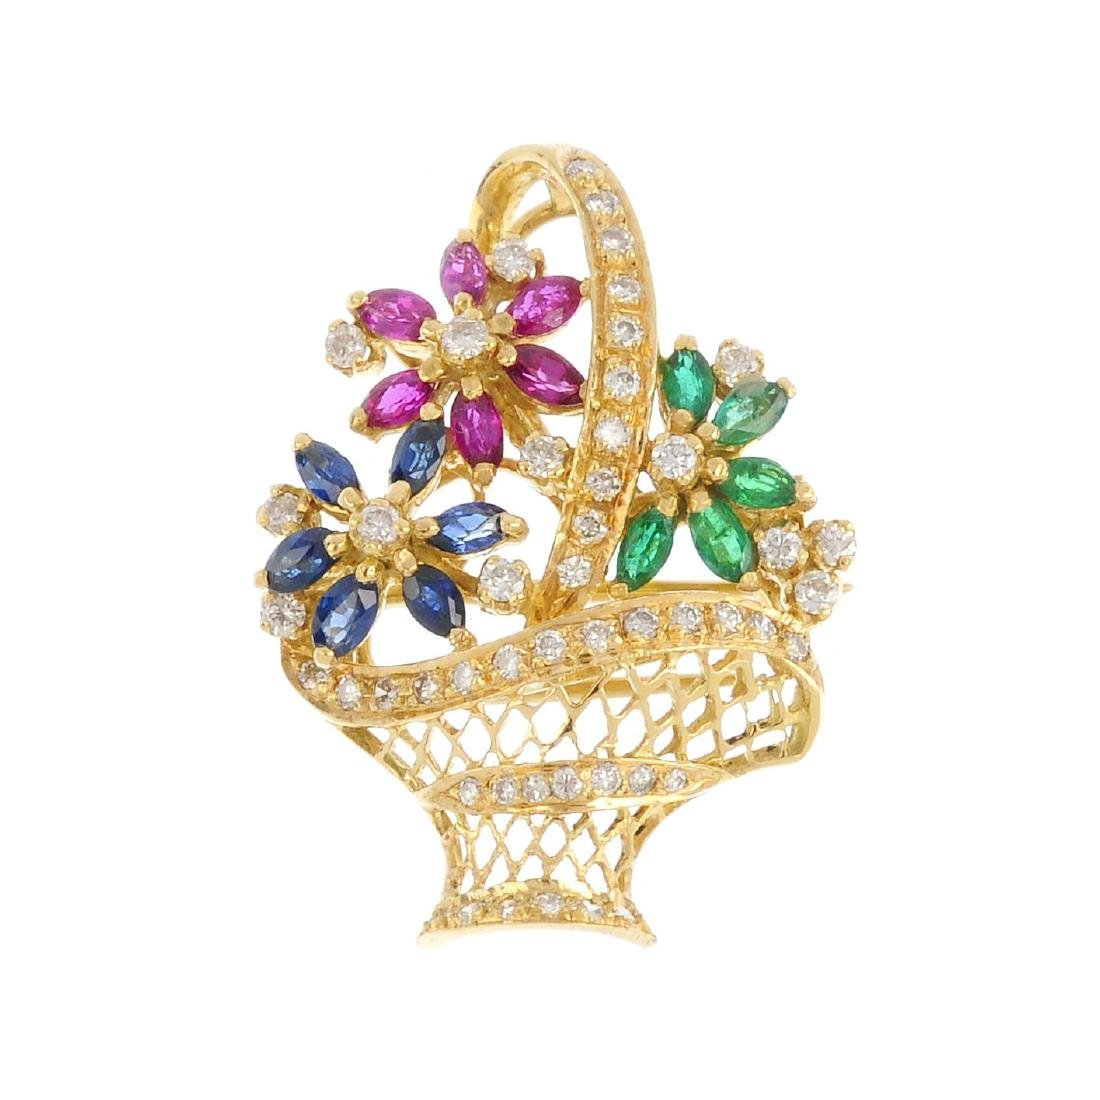 An 18ct gold diamond and gem-set brooch. Designed as a